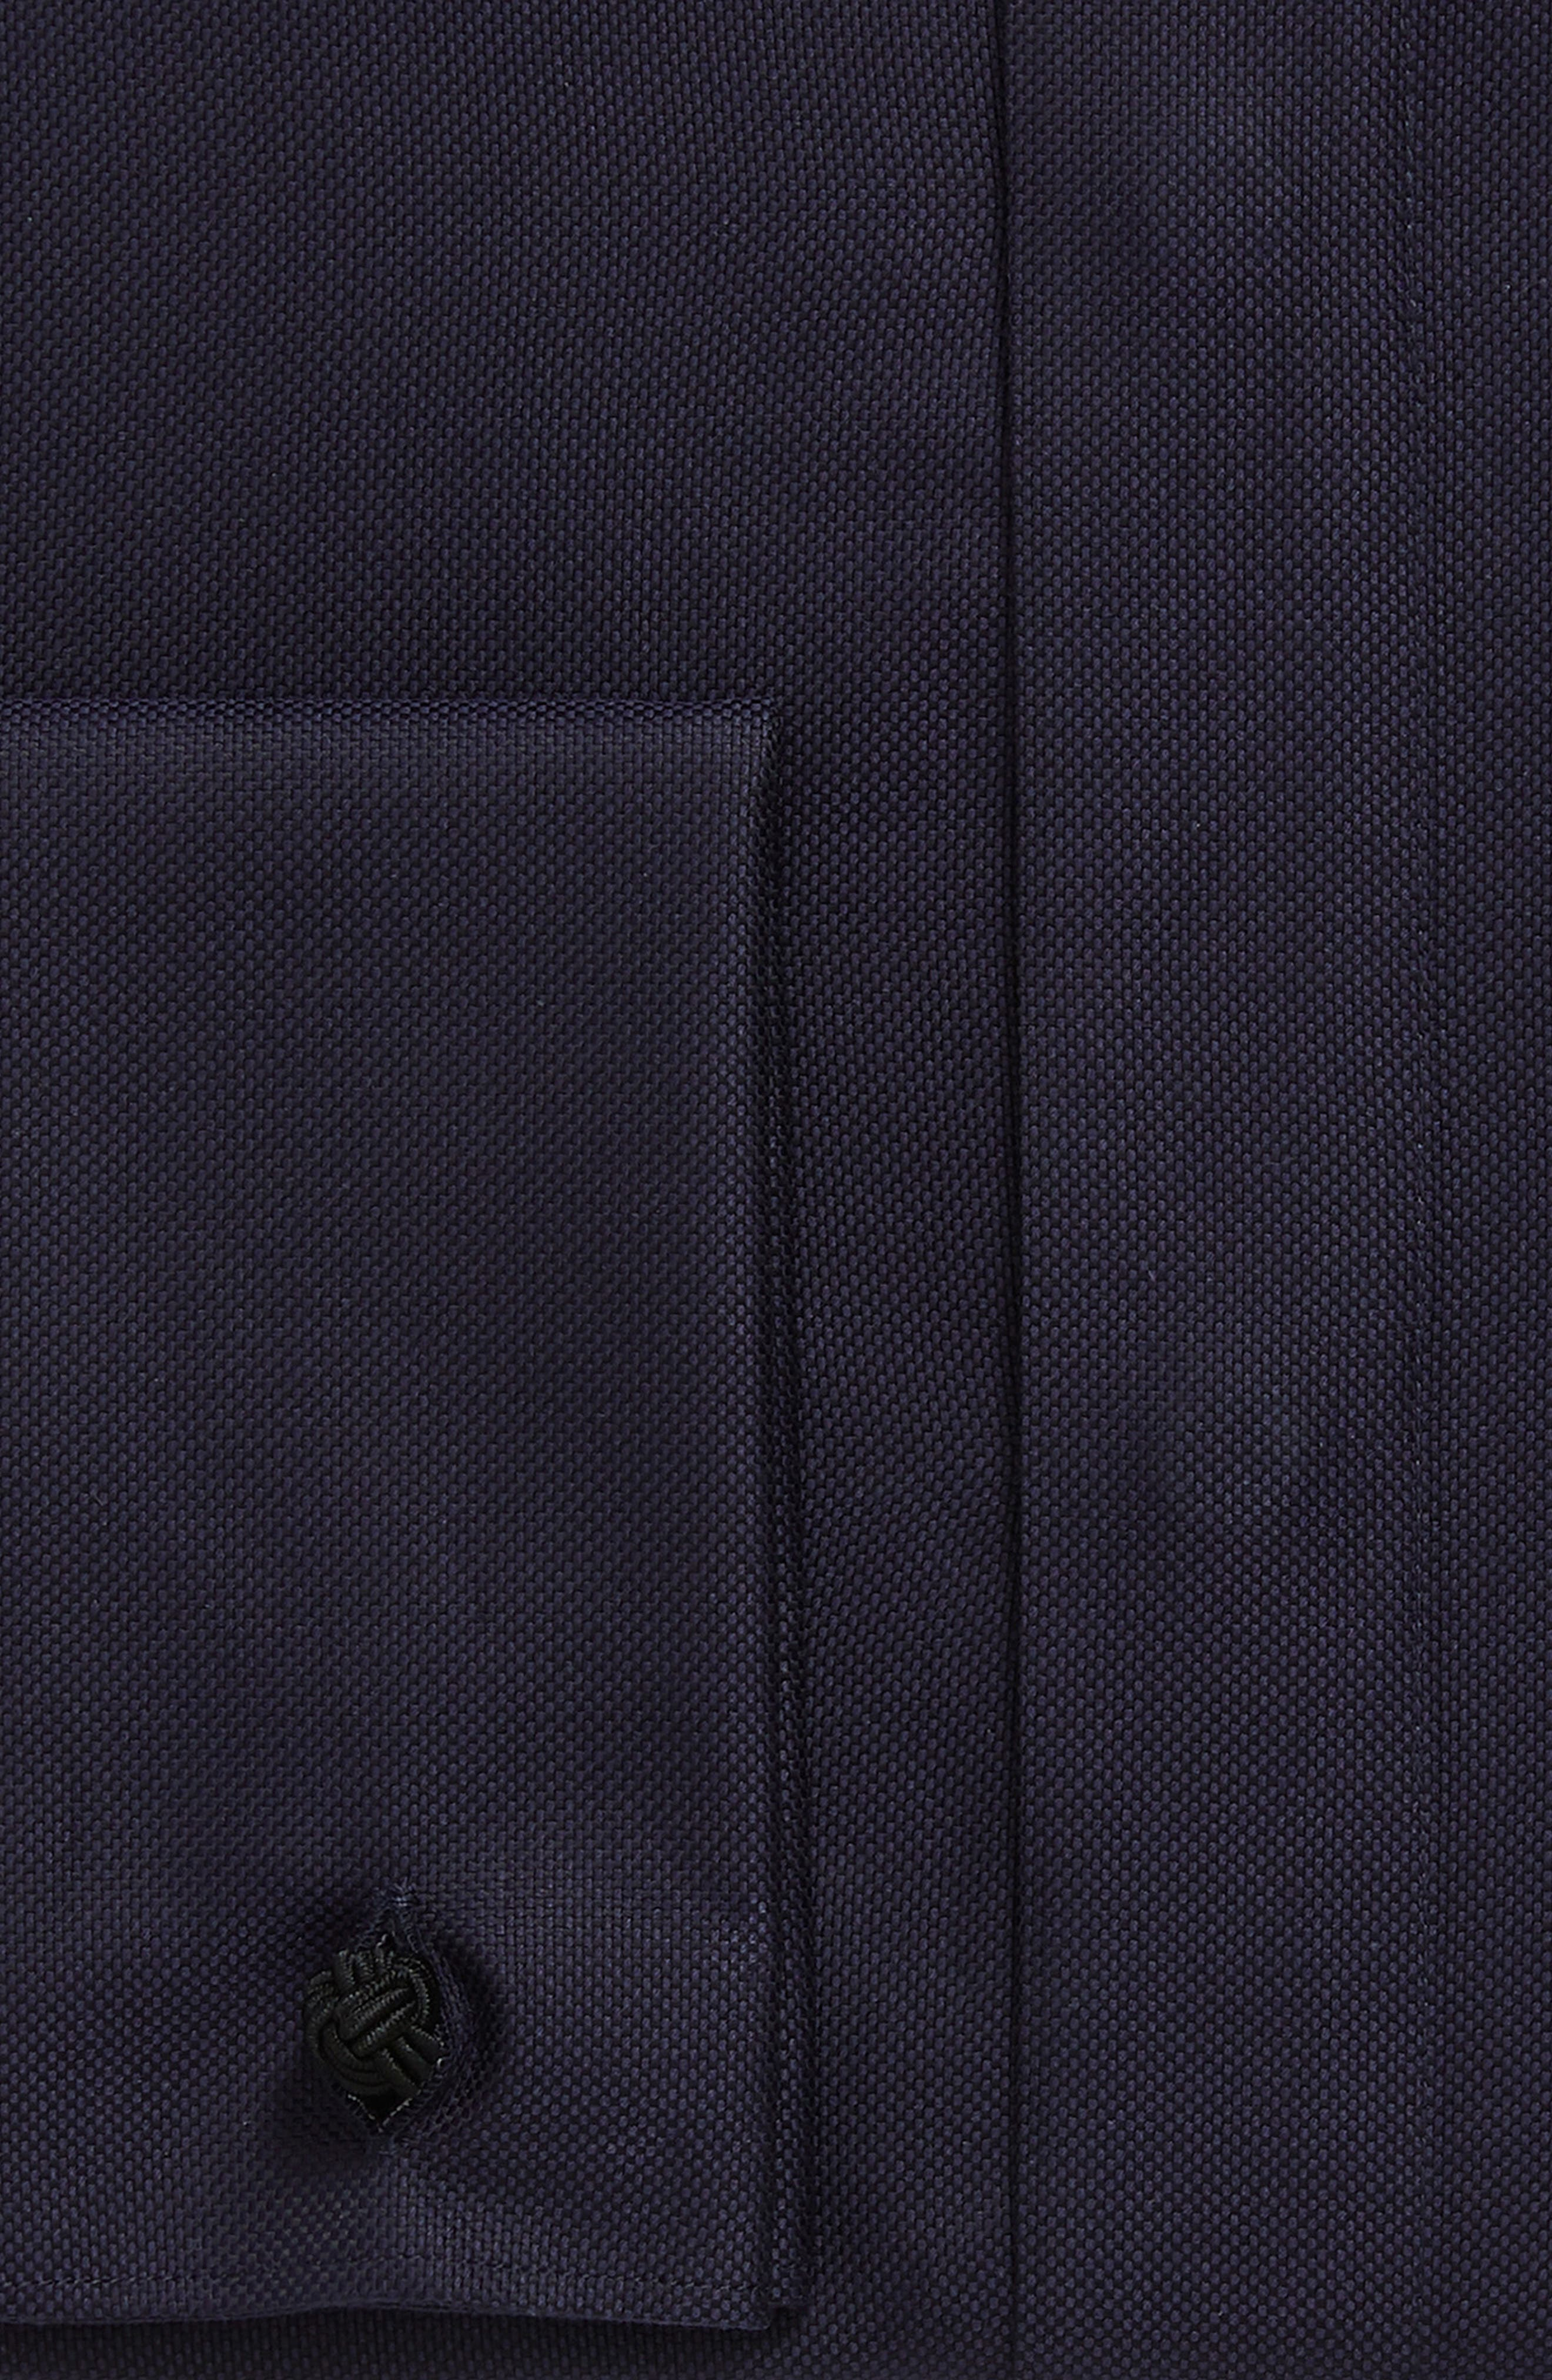 Slim Fit Solid Tuxedo Shirt,                             Alternate thumbnail 2, color,                             NAVY